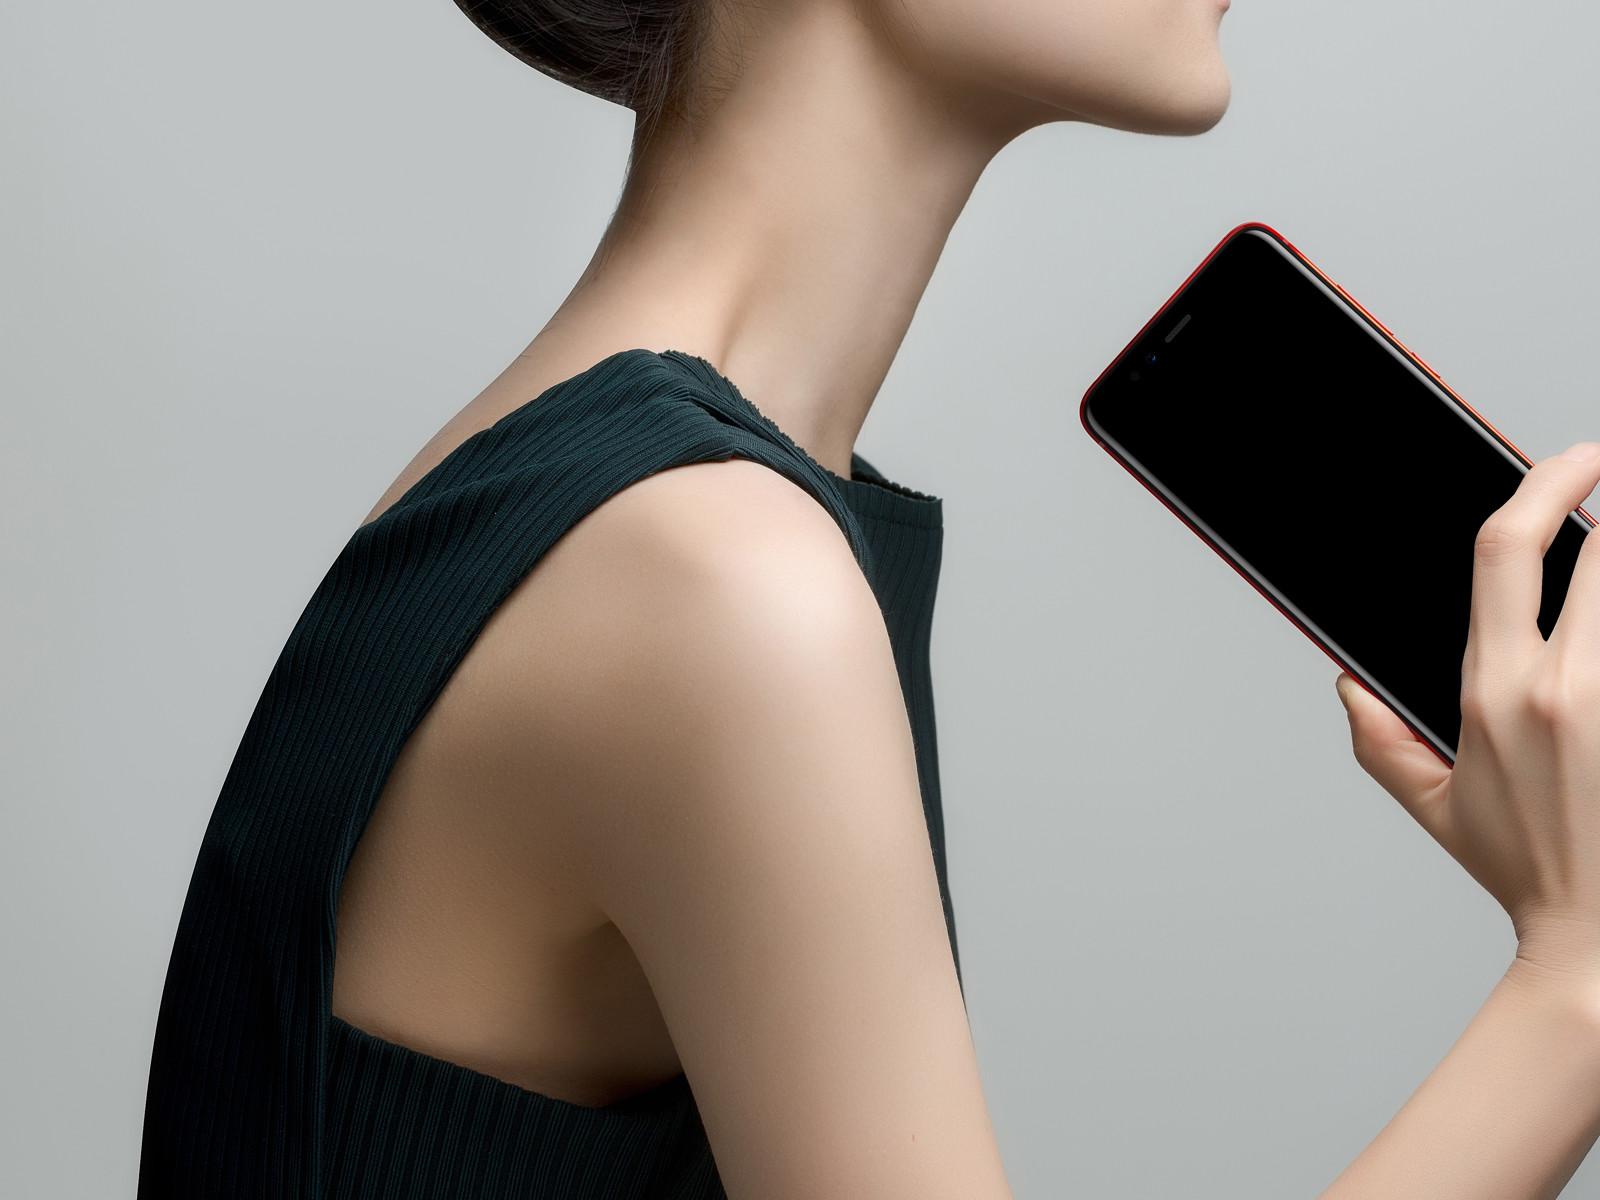 LenovoS5(4+64GB)时尚美图第6张